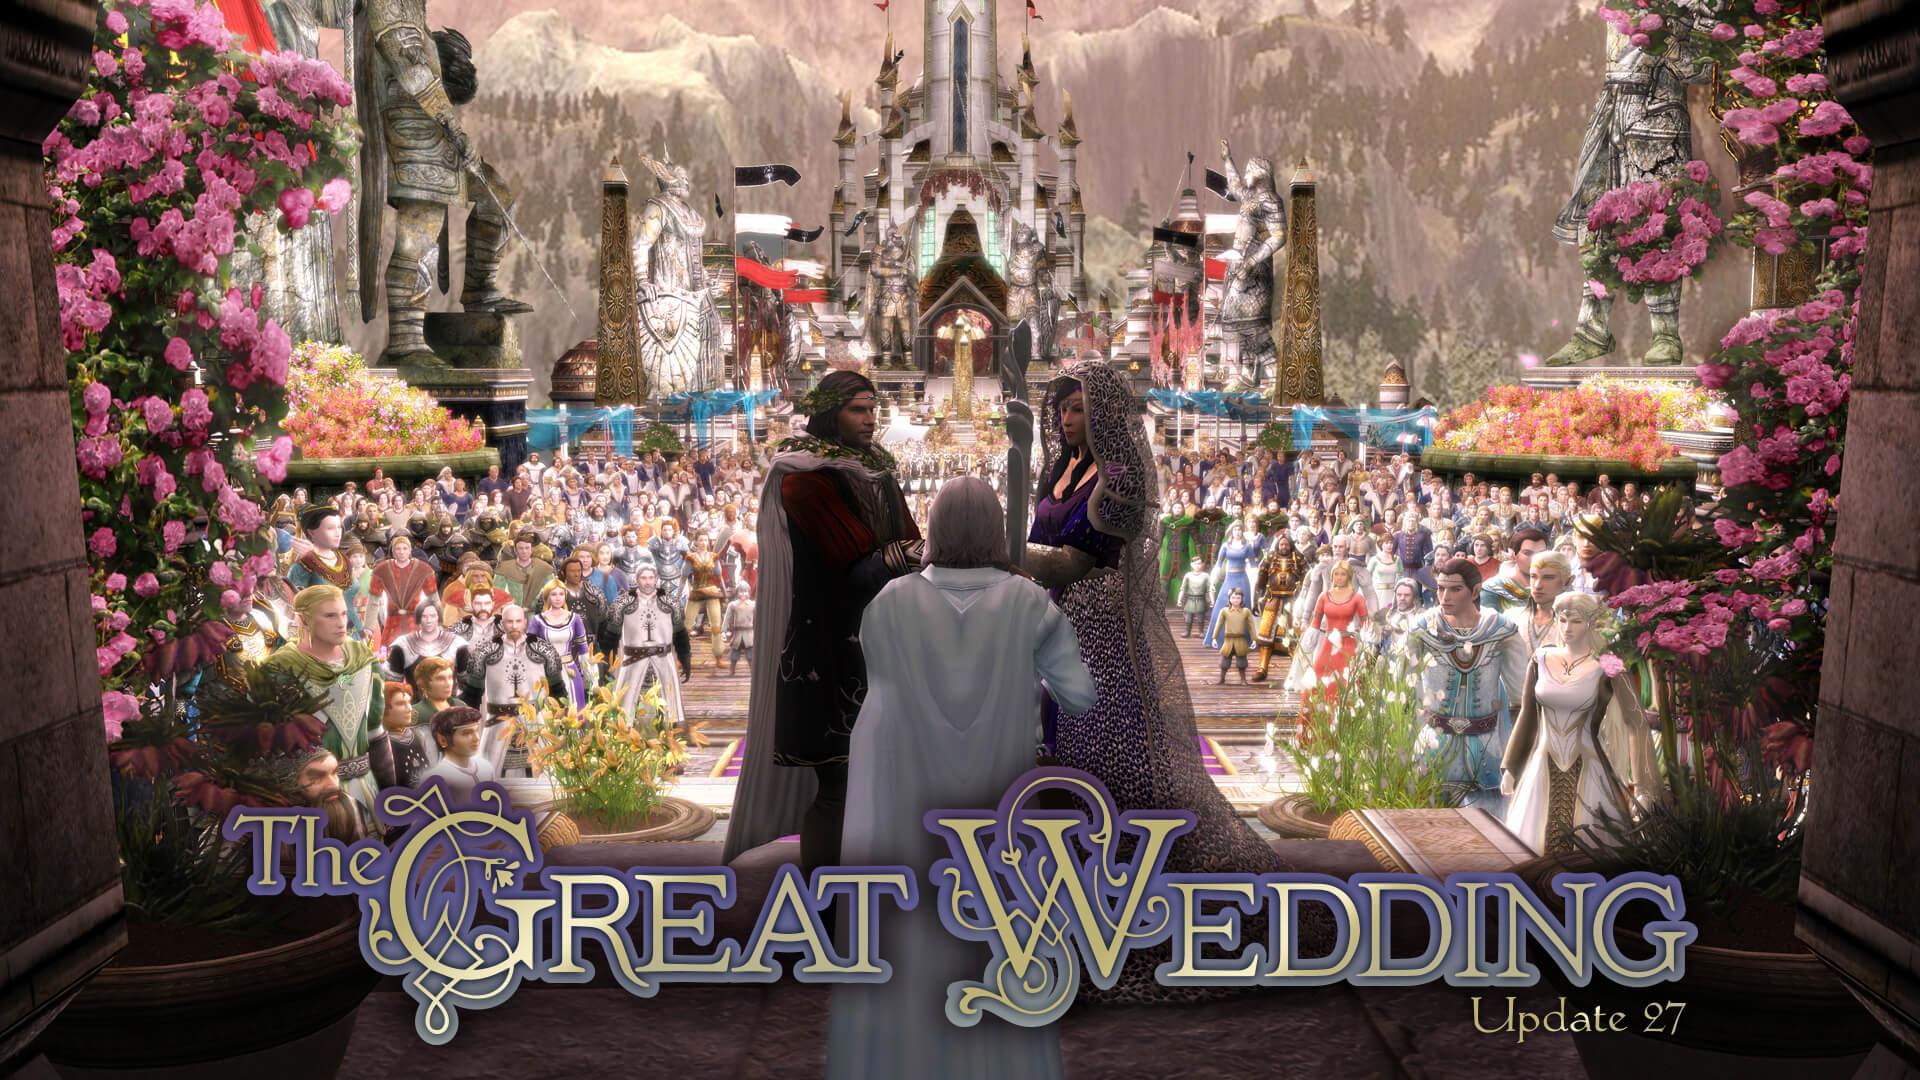 Lord Of The Rings Online celebra il matrimonio di Aragorn e Arwen thumbnail